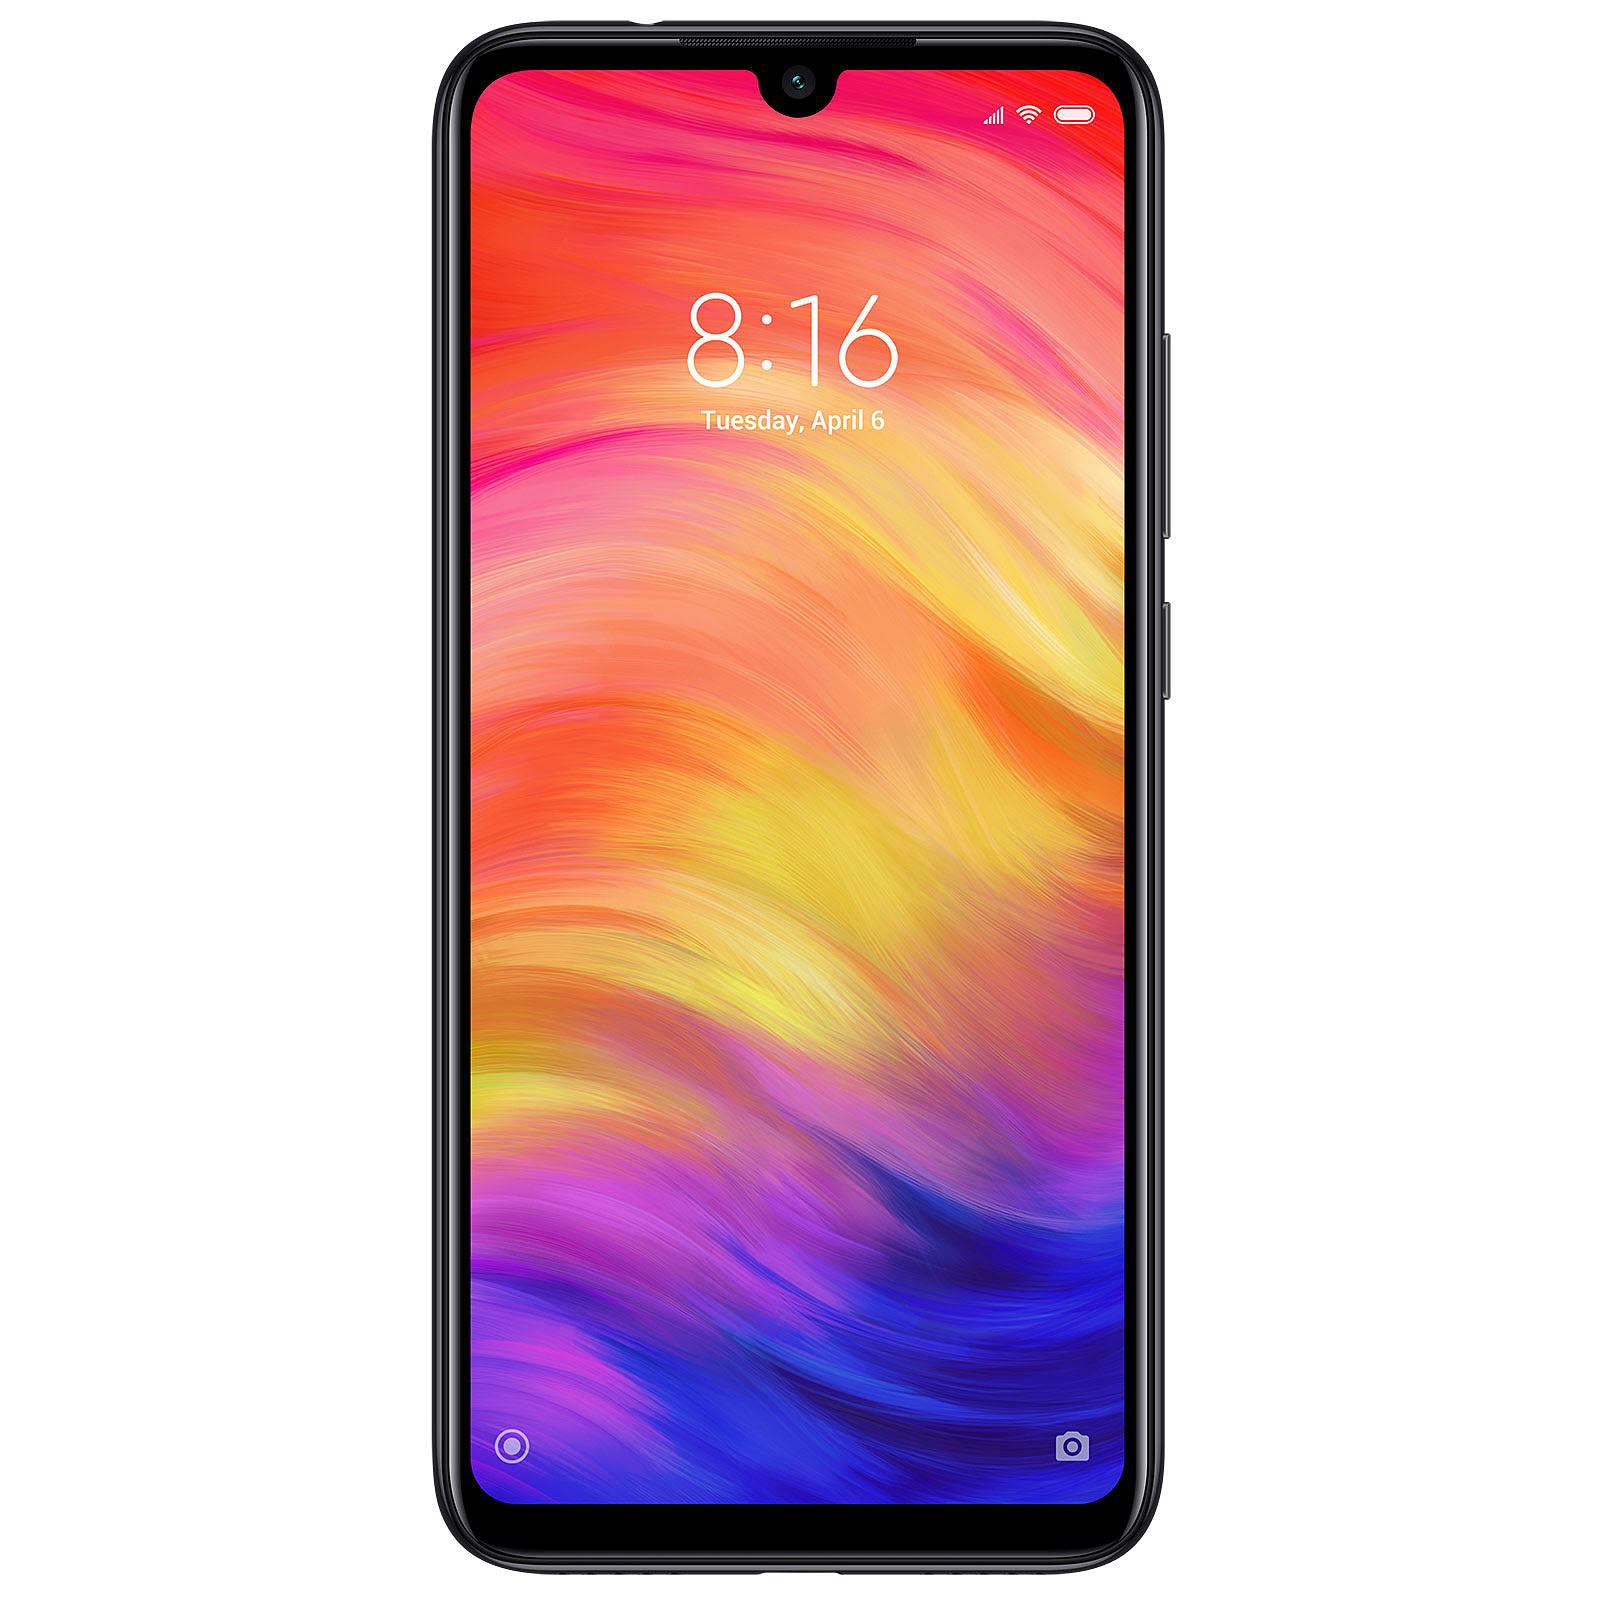 Xiaomi Redmi Note 7 4Go 64Go Noir - Téléphonie Xiaomi - 0